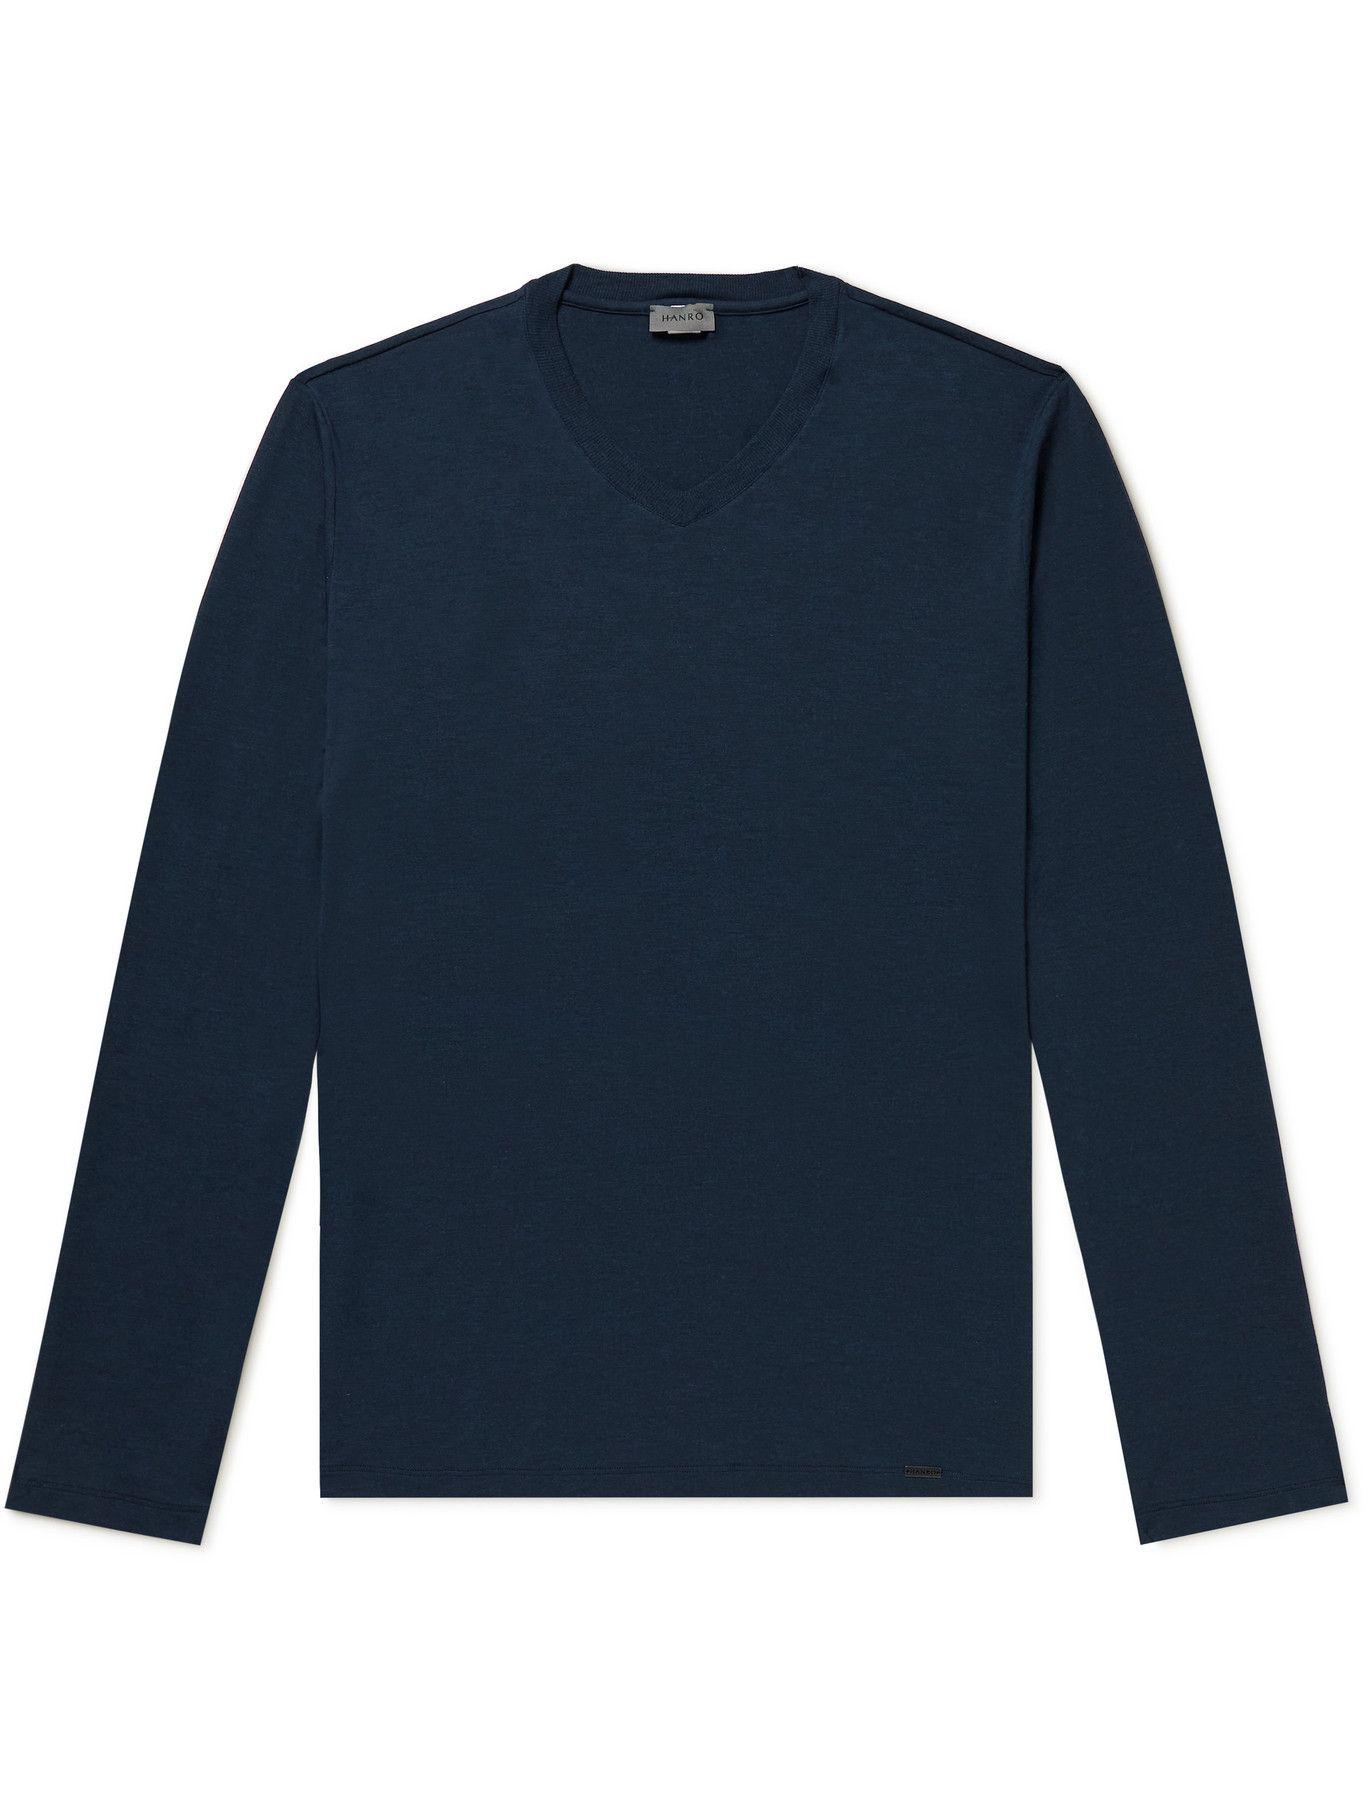 HANRO - Stretch-Jersey Pyjama T-Shirt - Blue